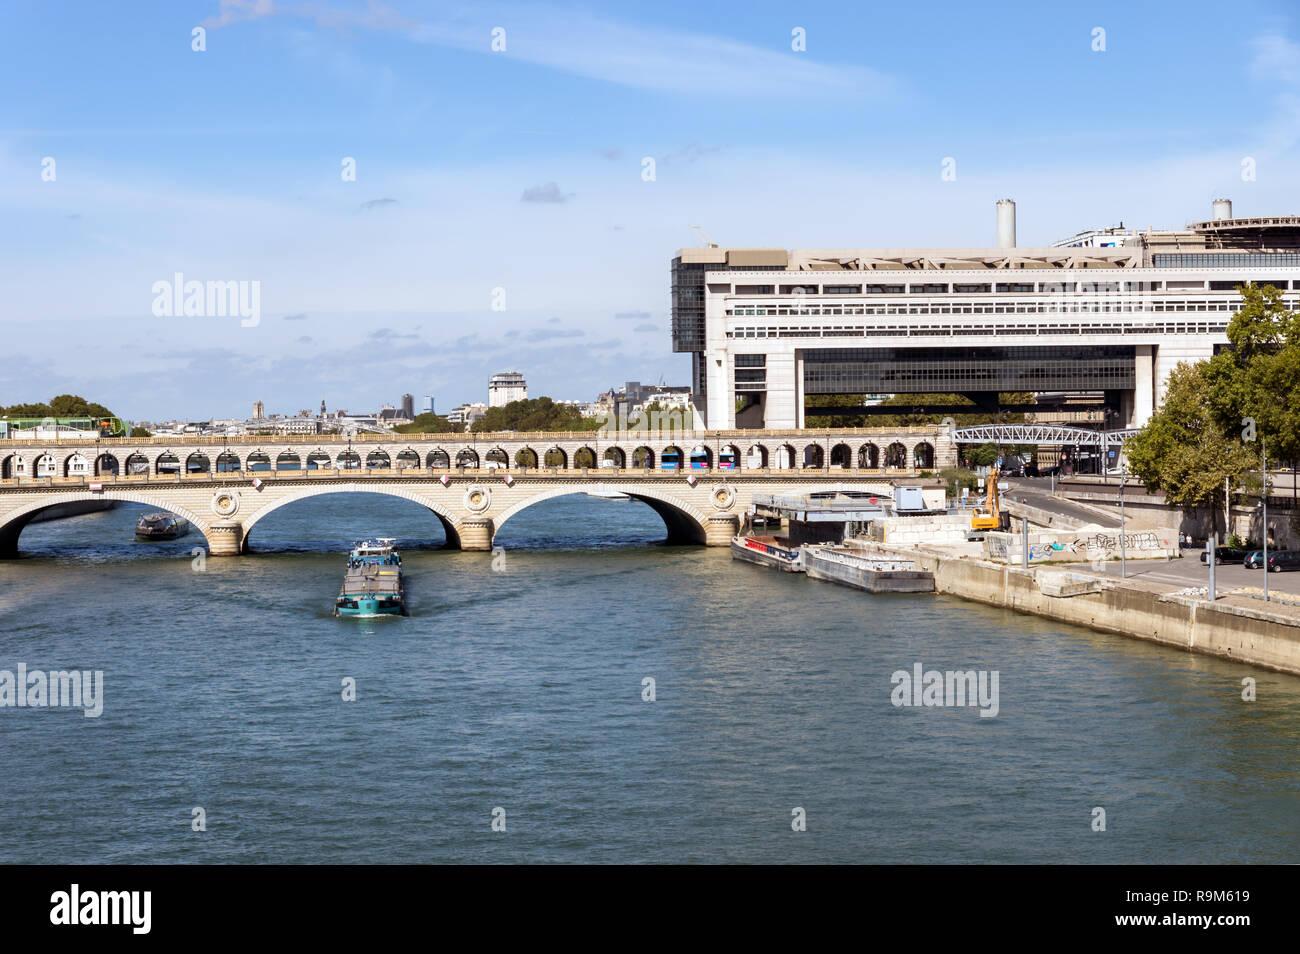 Bercy bridge over the Seine - Paris - Stock Image